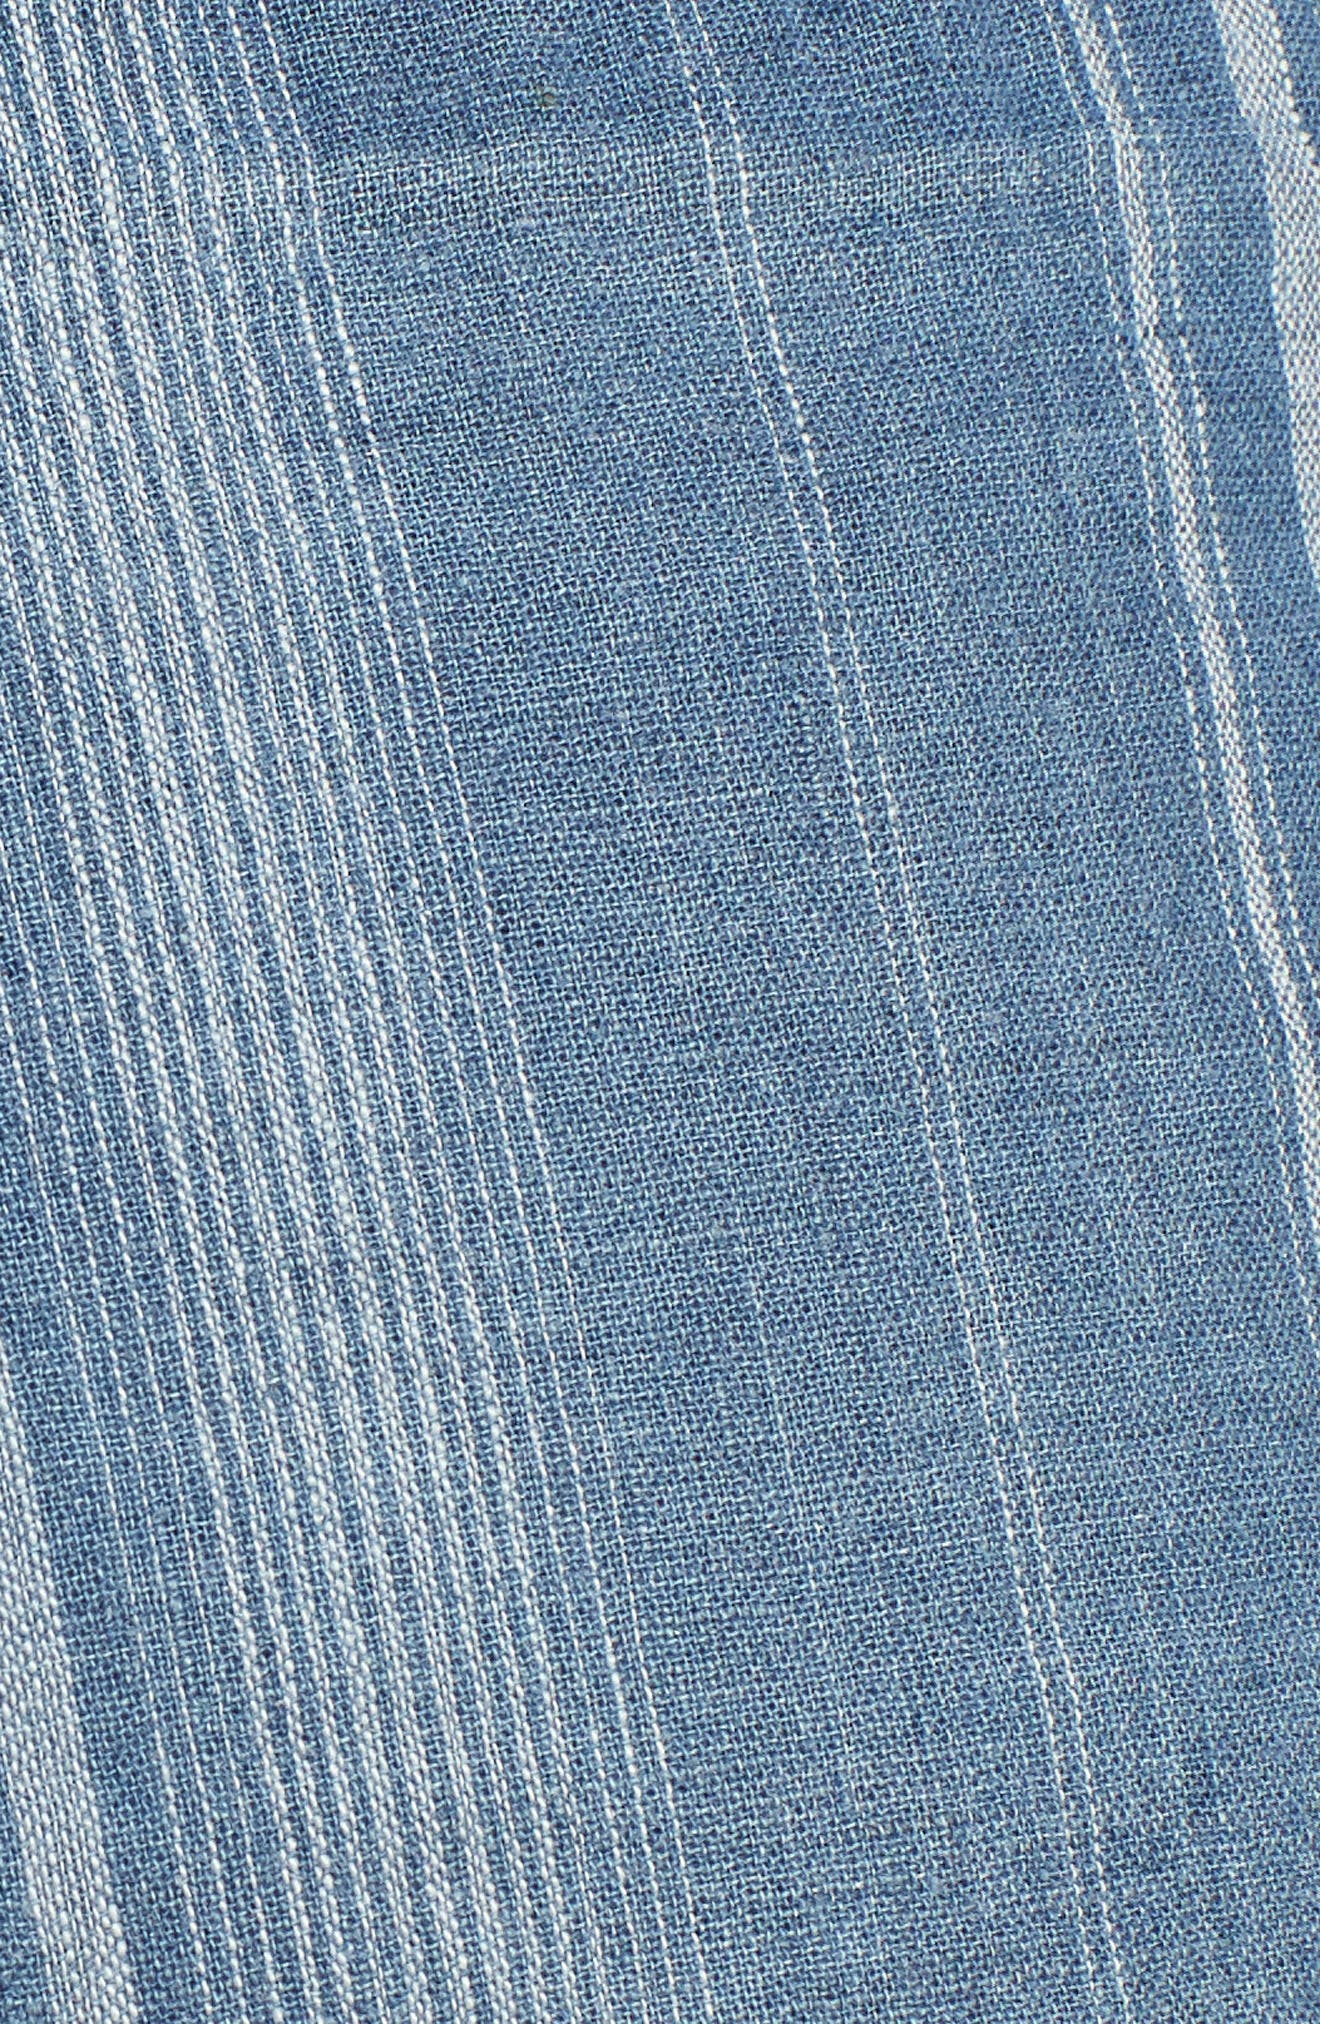 High Rise Striped Shorts,                             Alternate thumbnail 6, color,